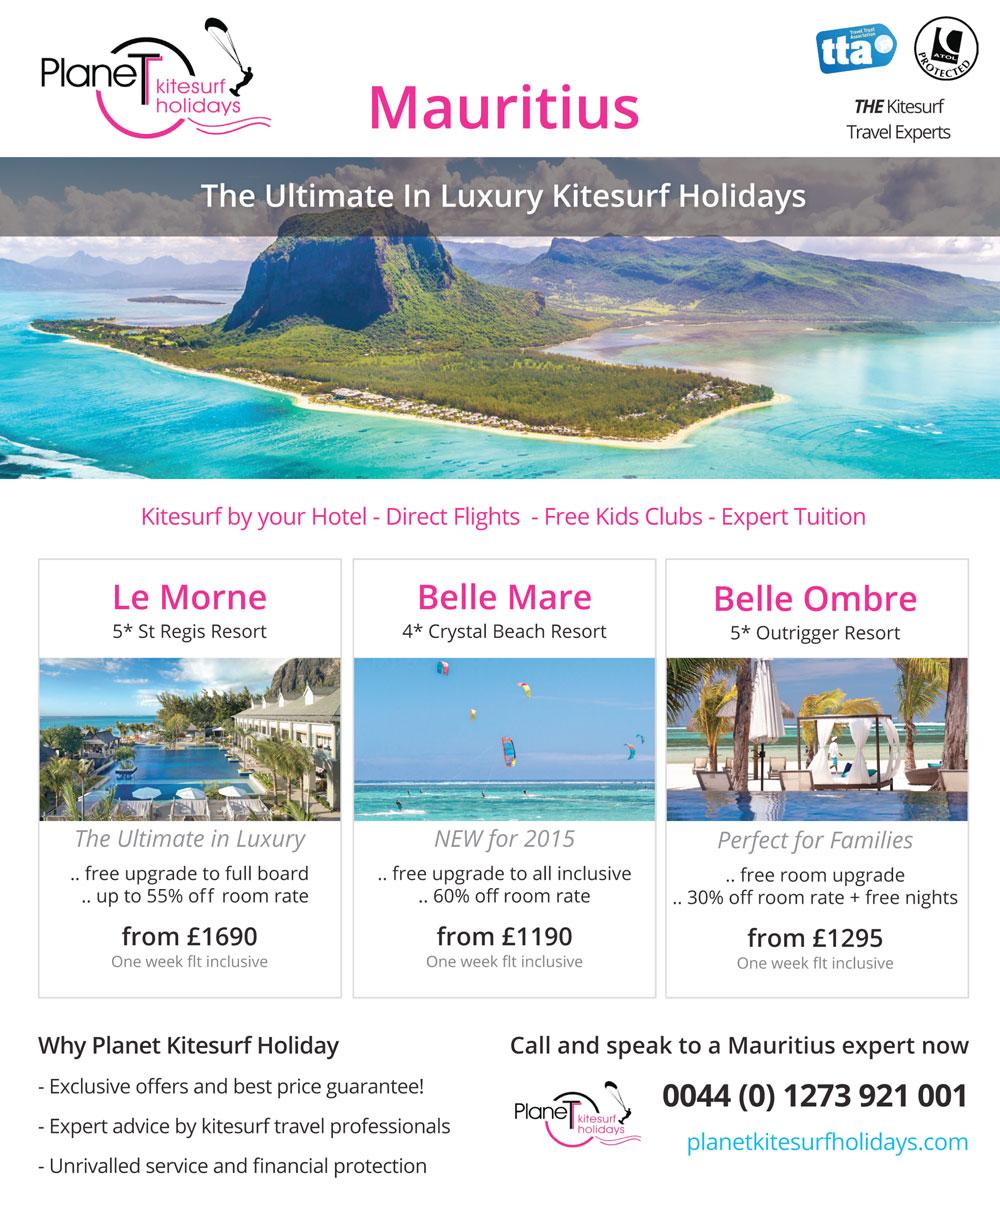 Planet Kitesurfing Mauritius offers